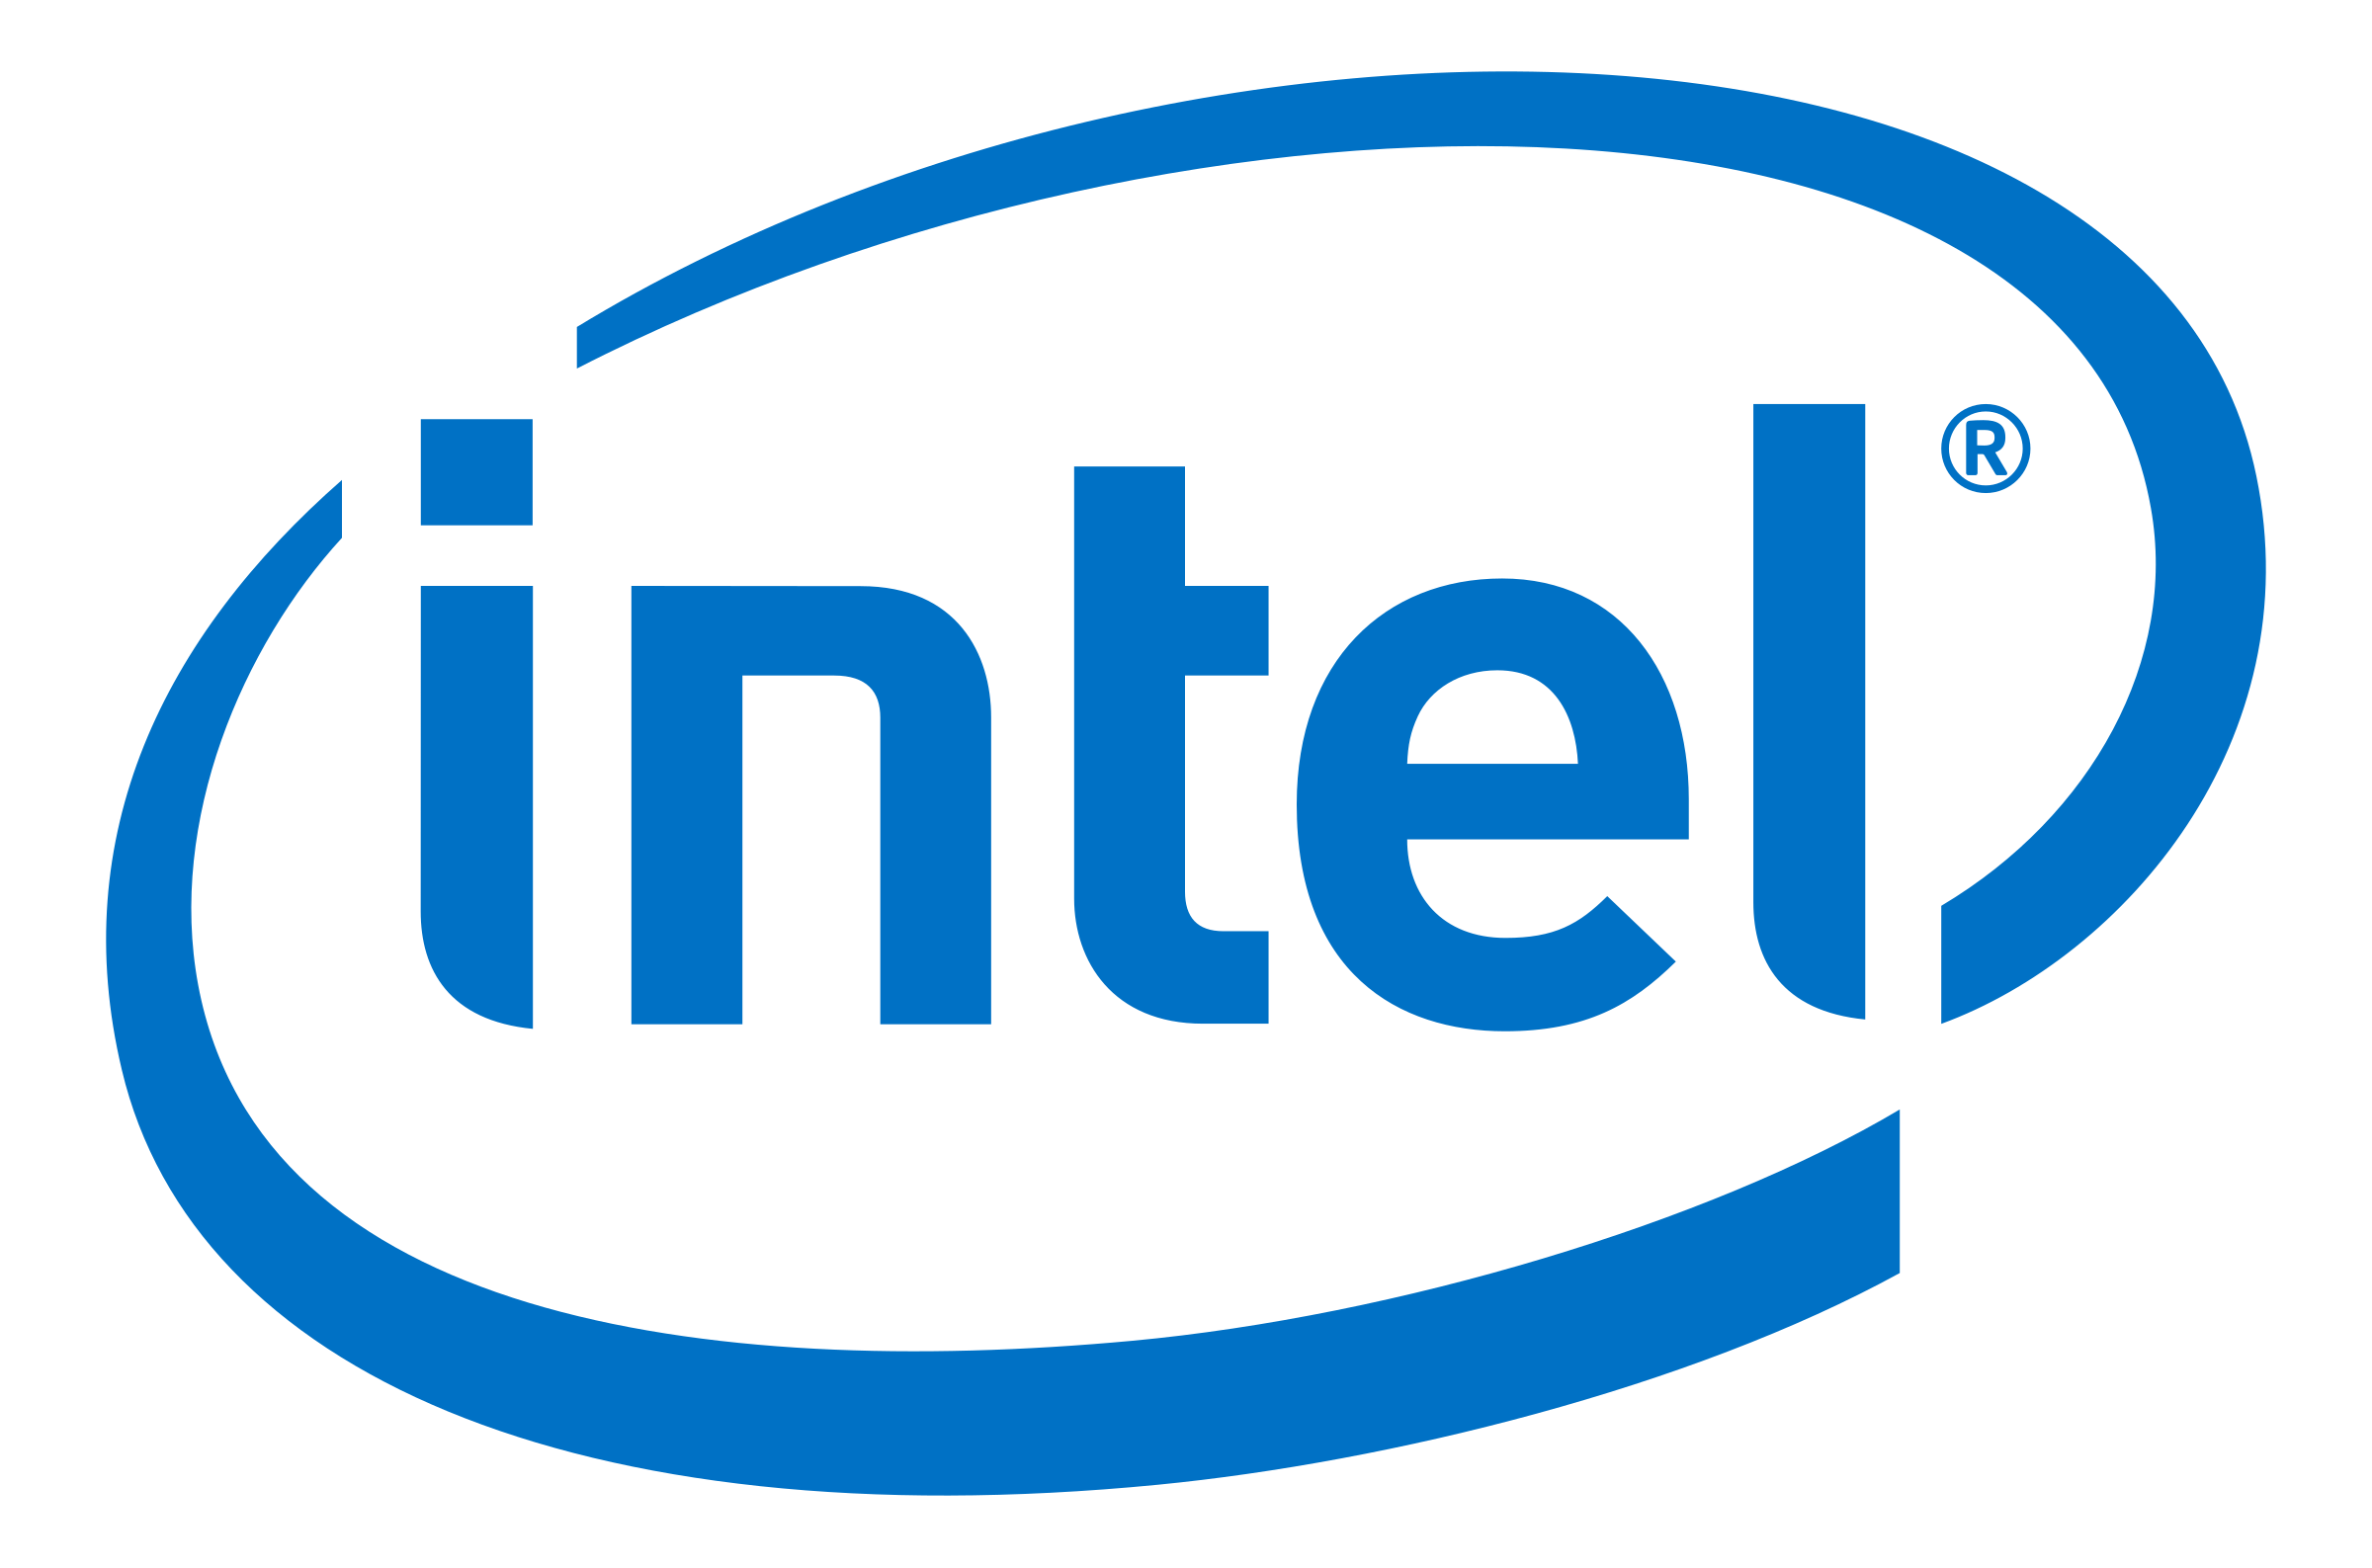 Intel Logo PNG Transparent & SVG Vector.